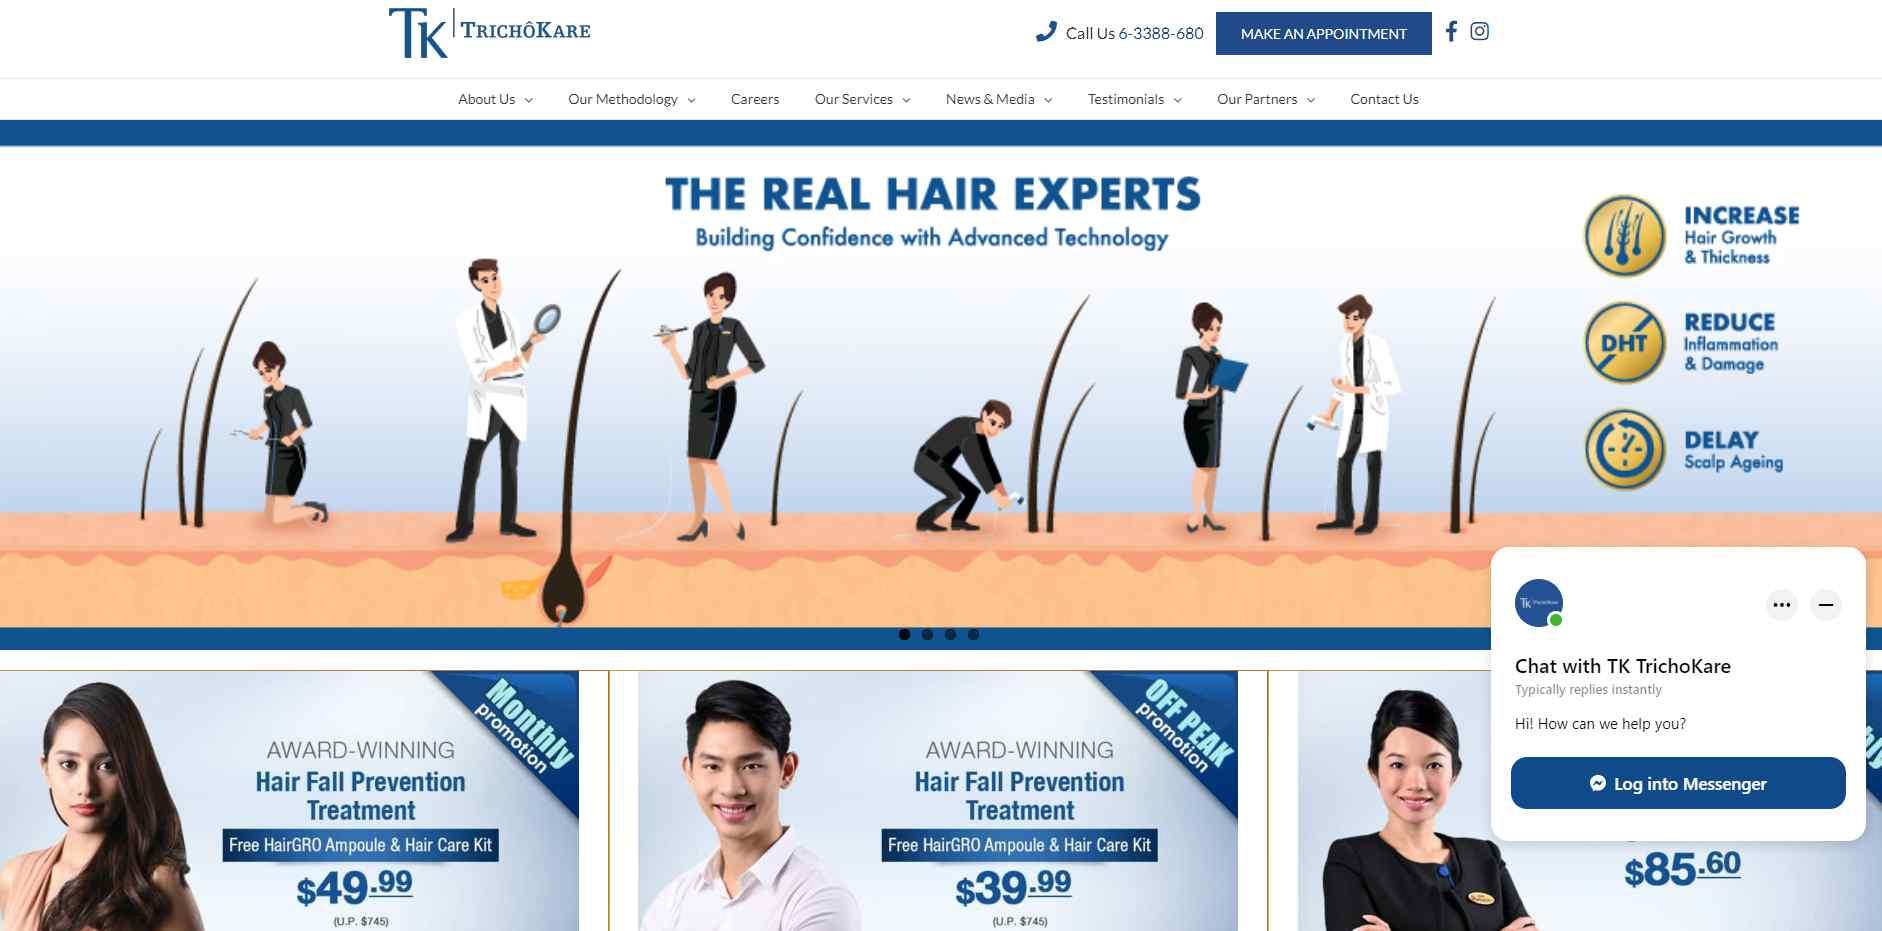 TK Top Hair Loss Treatment Clinics in Singapore